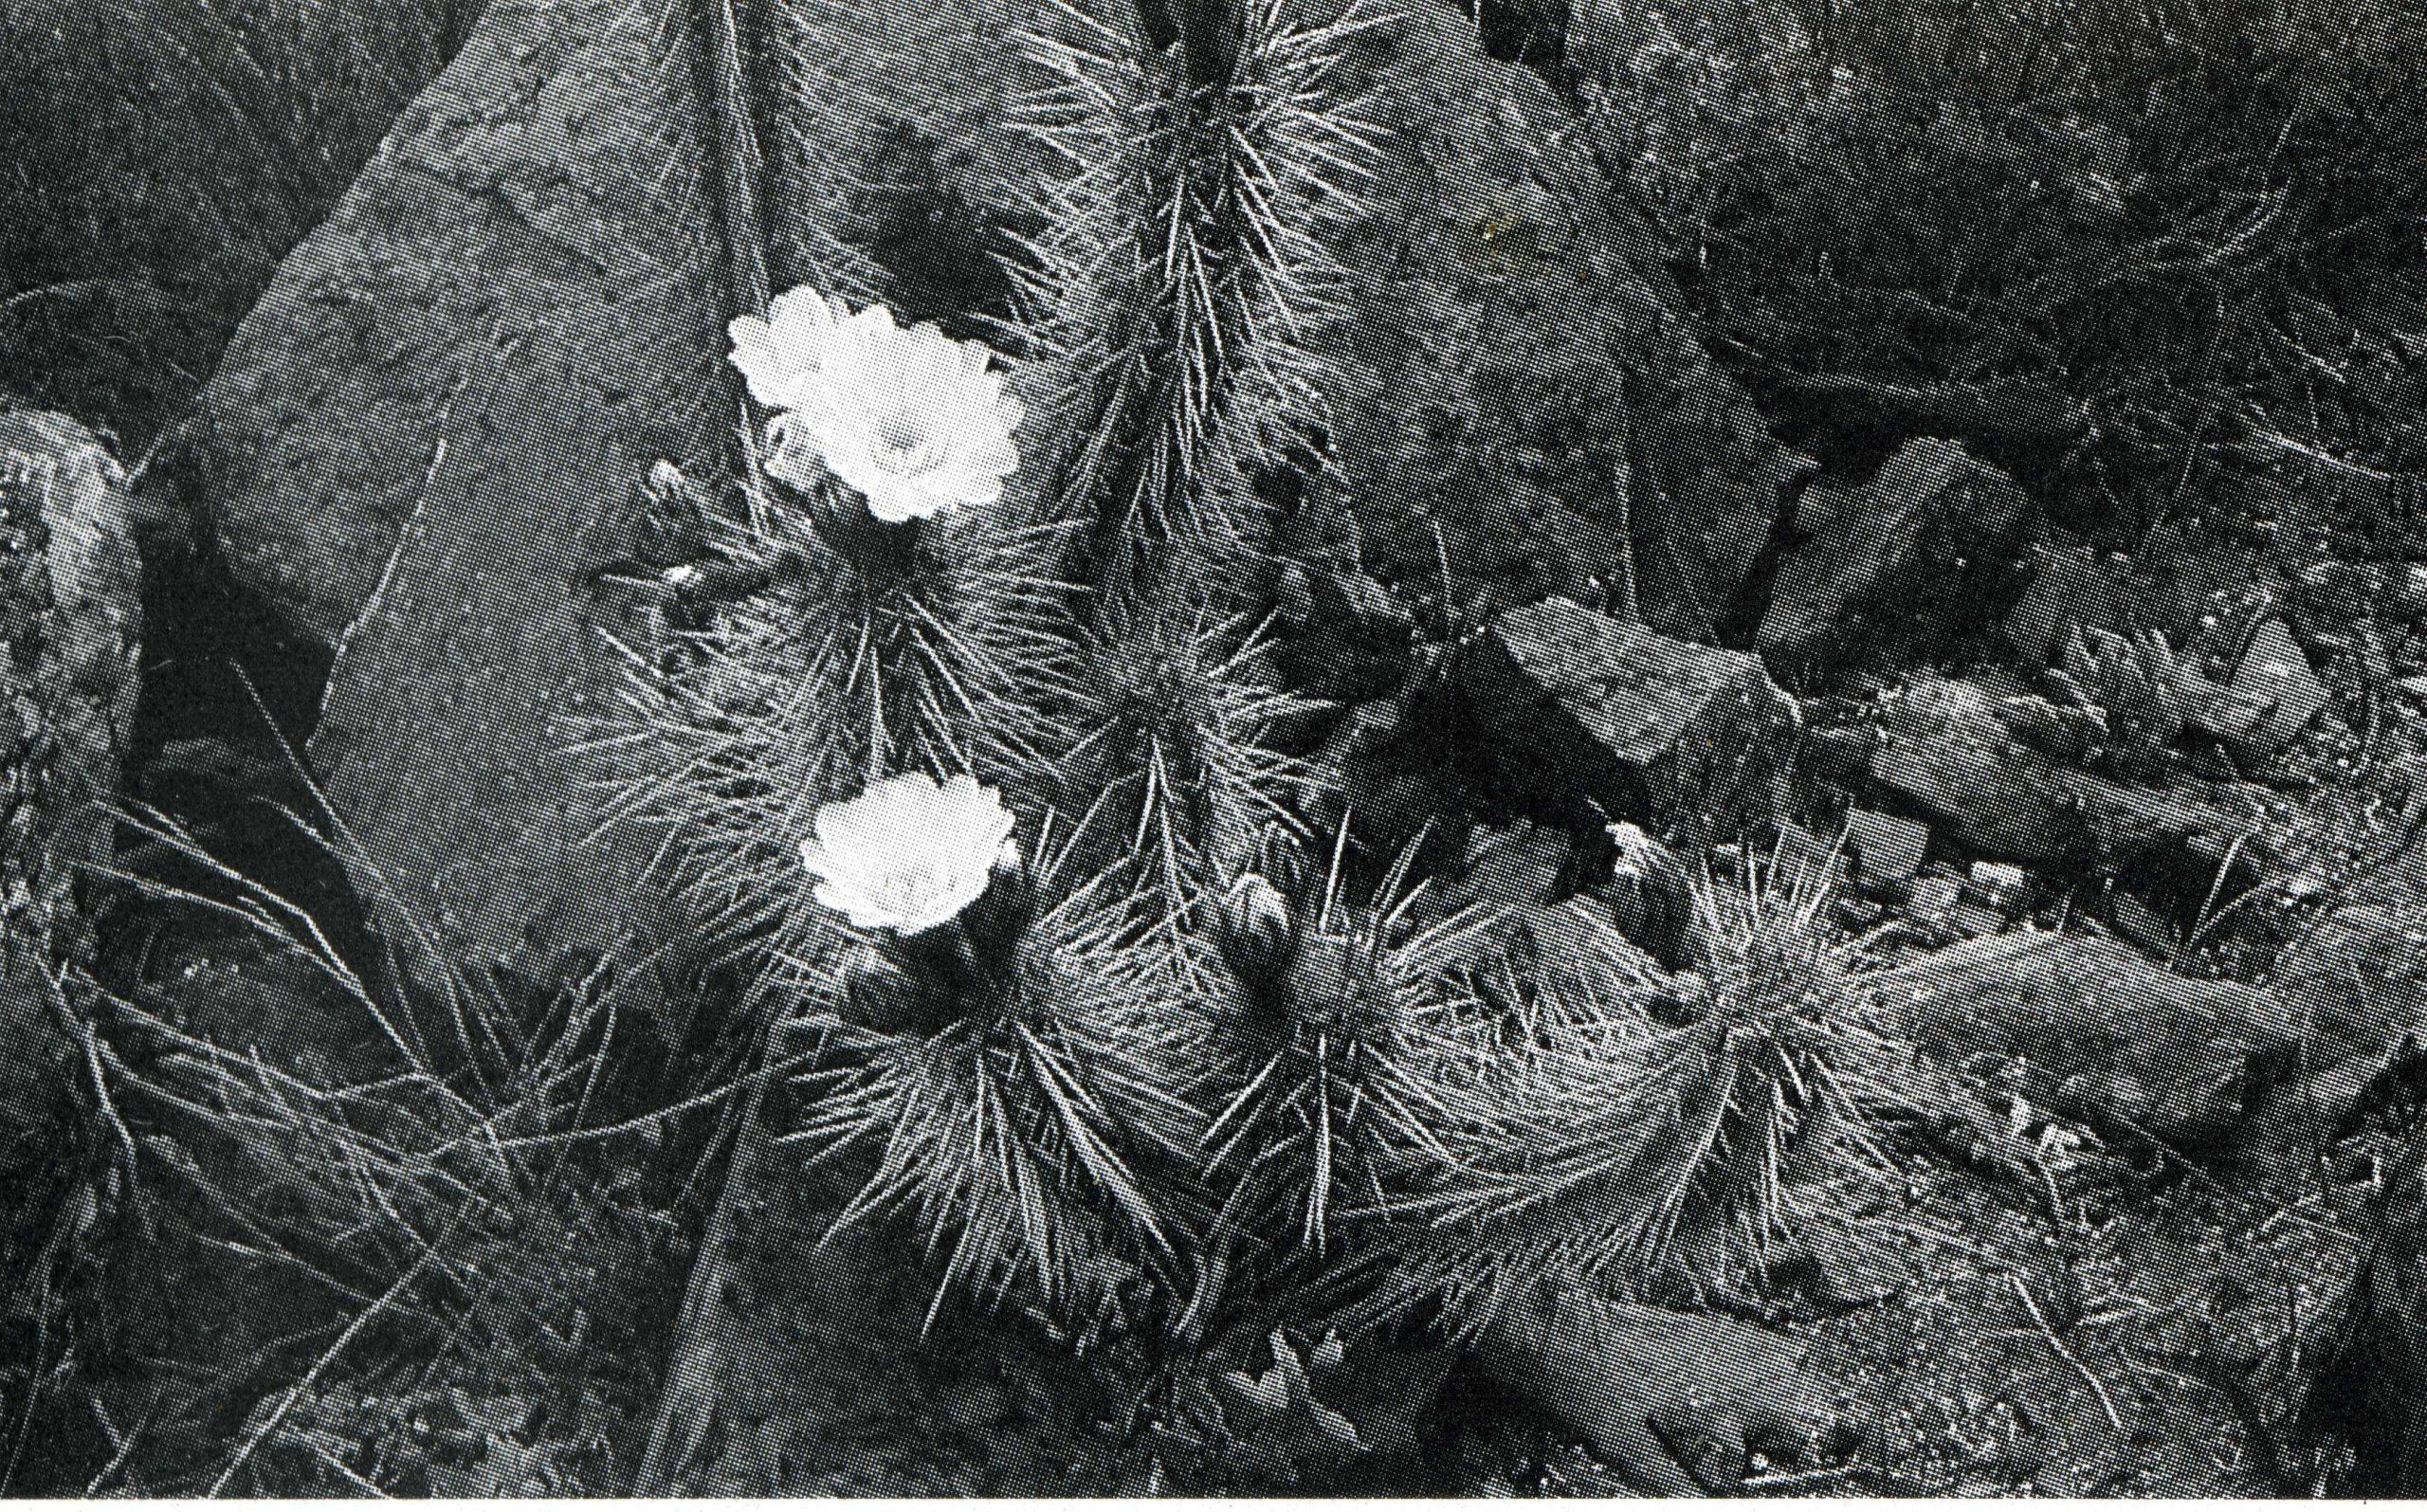 Trichocereus Spinibarbis aka Nigripilis312 scaled FR536